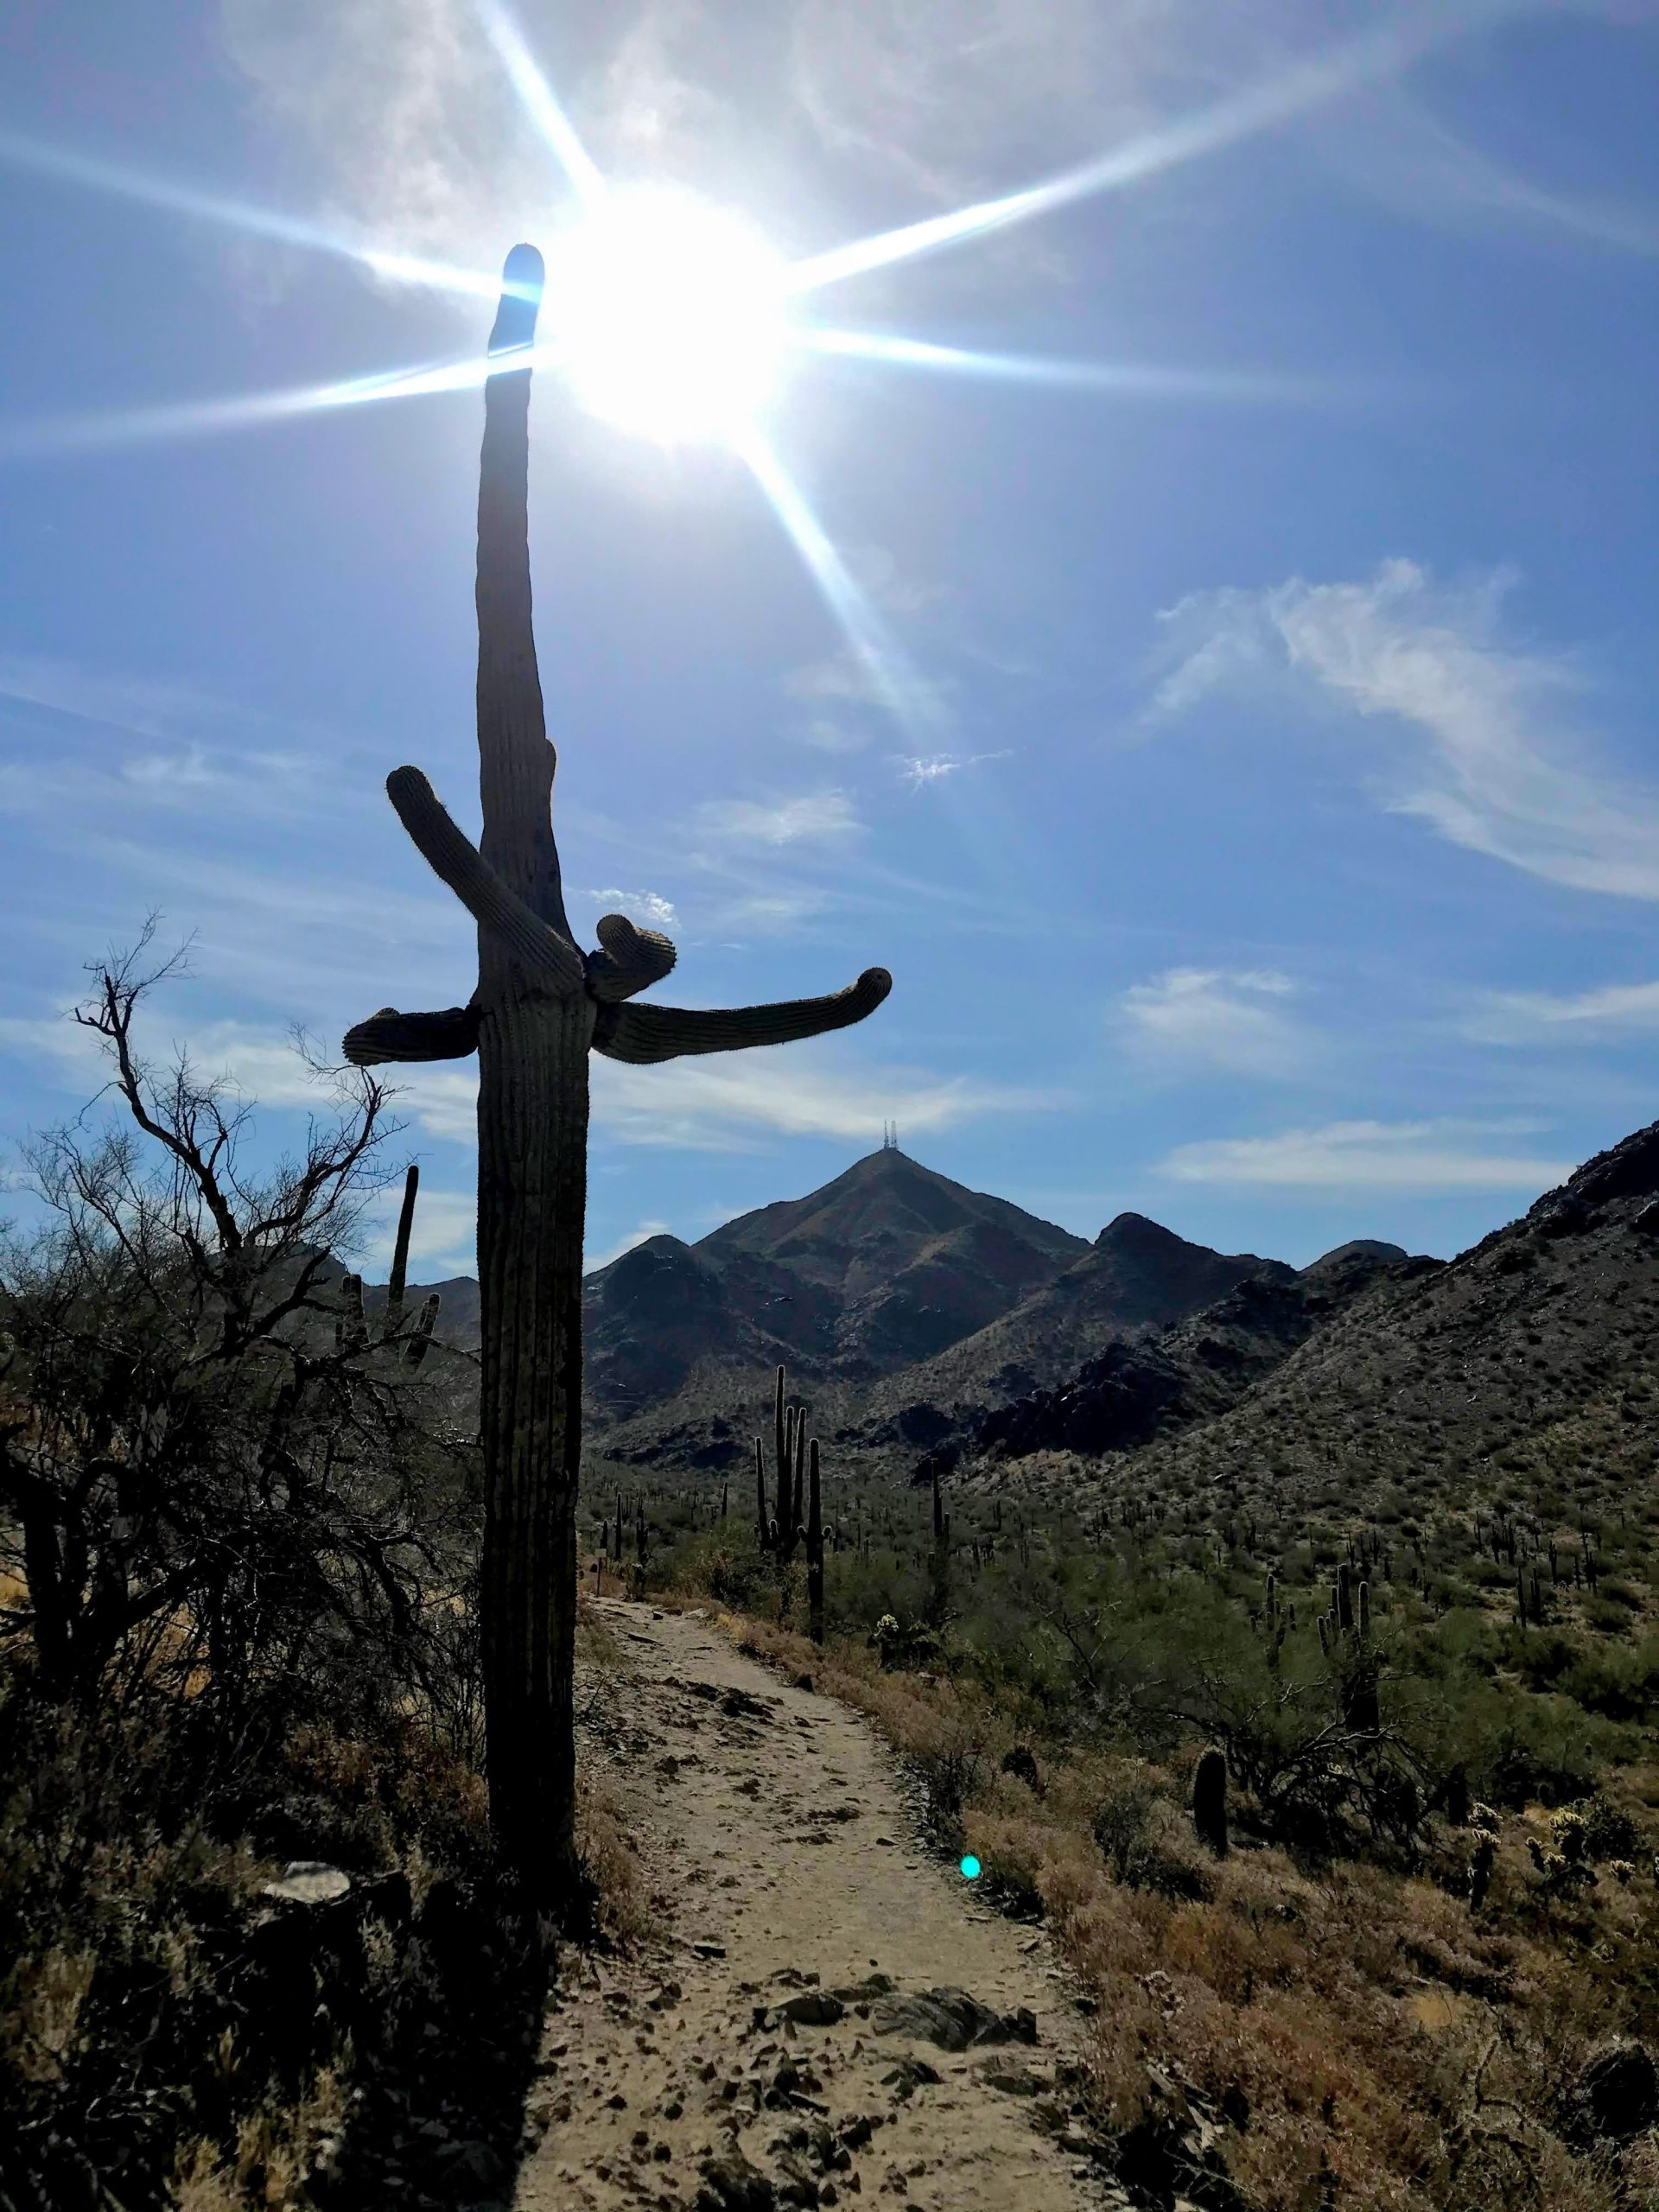 Levee Trail Hike Mcdowell Sonoran Preserve Thompson peak 2